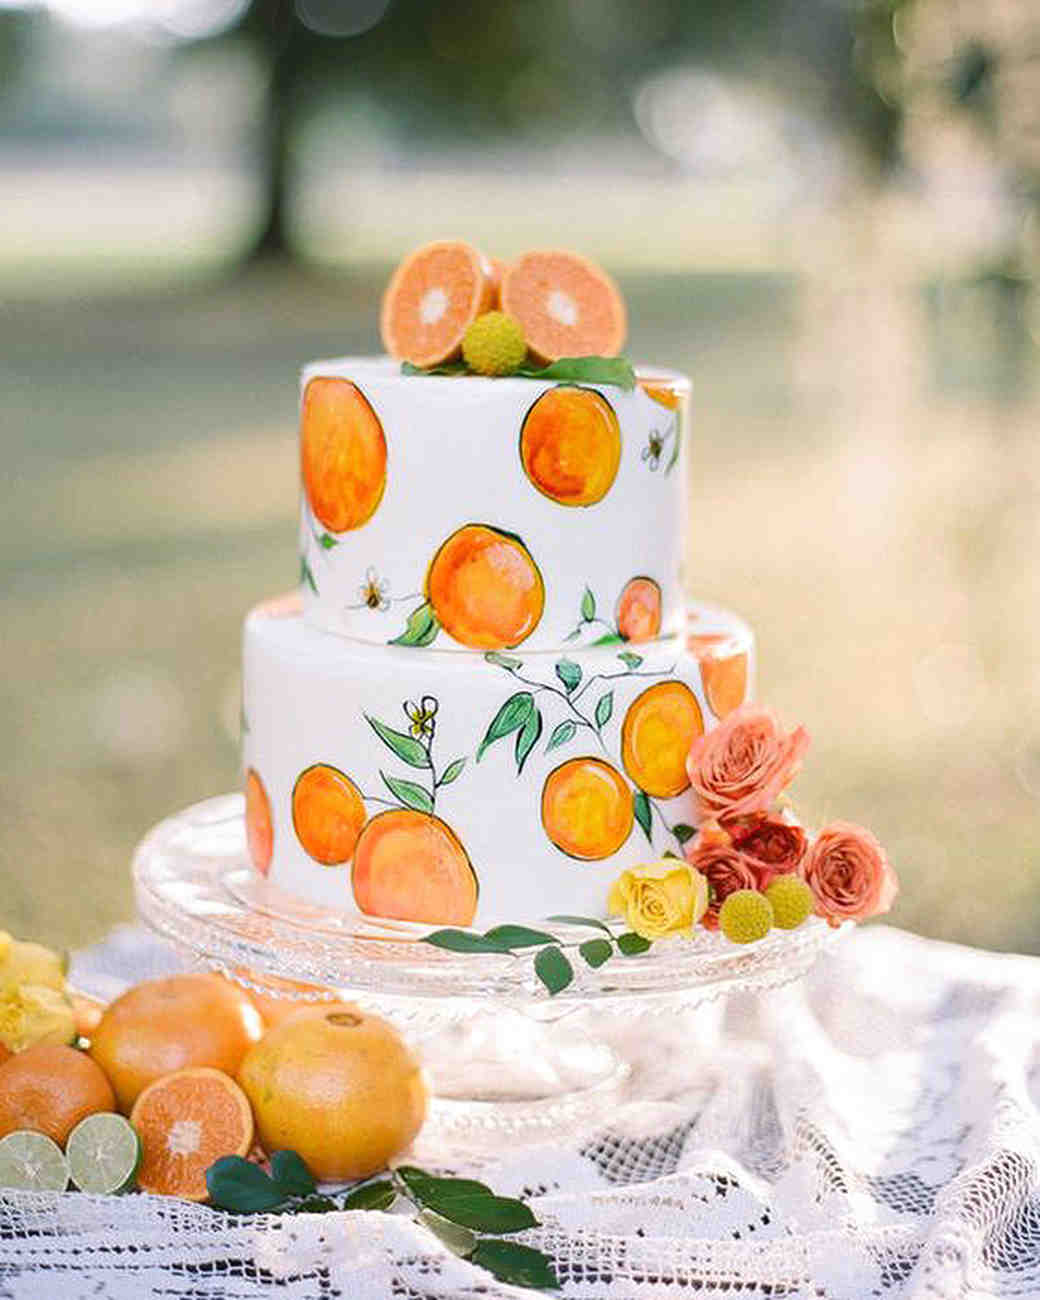 Martha Stewart Trending Hand Painted Cakes